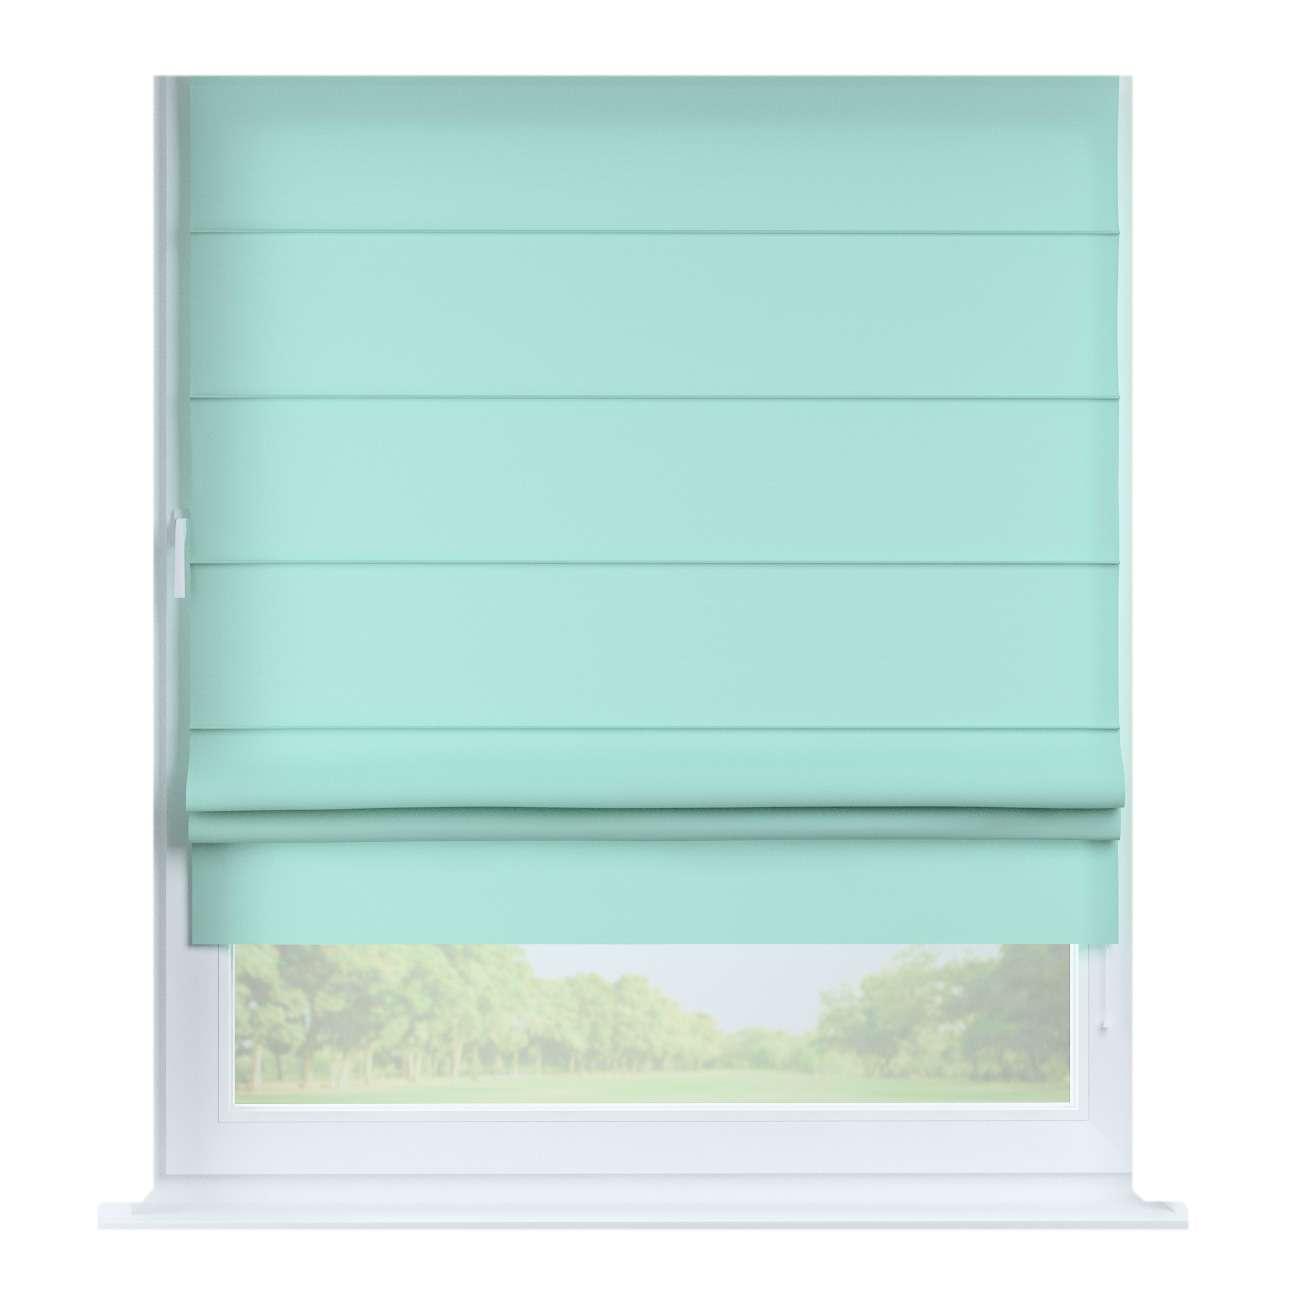 Padva roman blind  80 x 170 cm (31.5 x 67 inch) in collection Loneta , fabric: 133-32